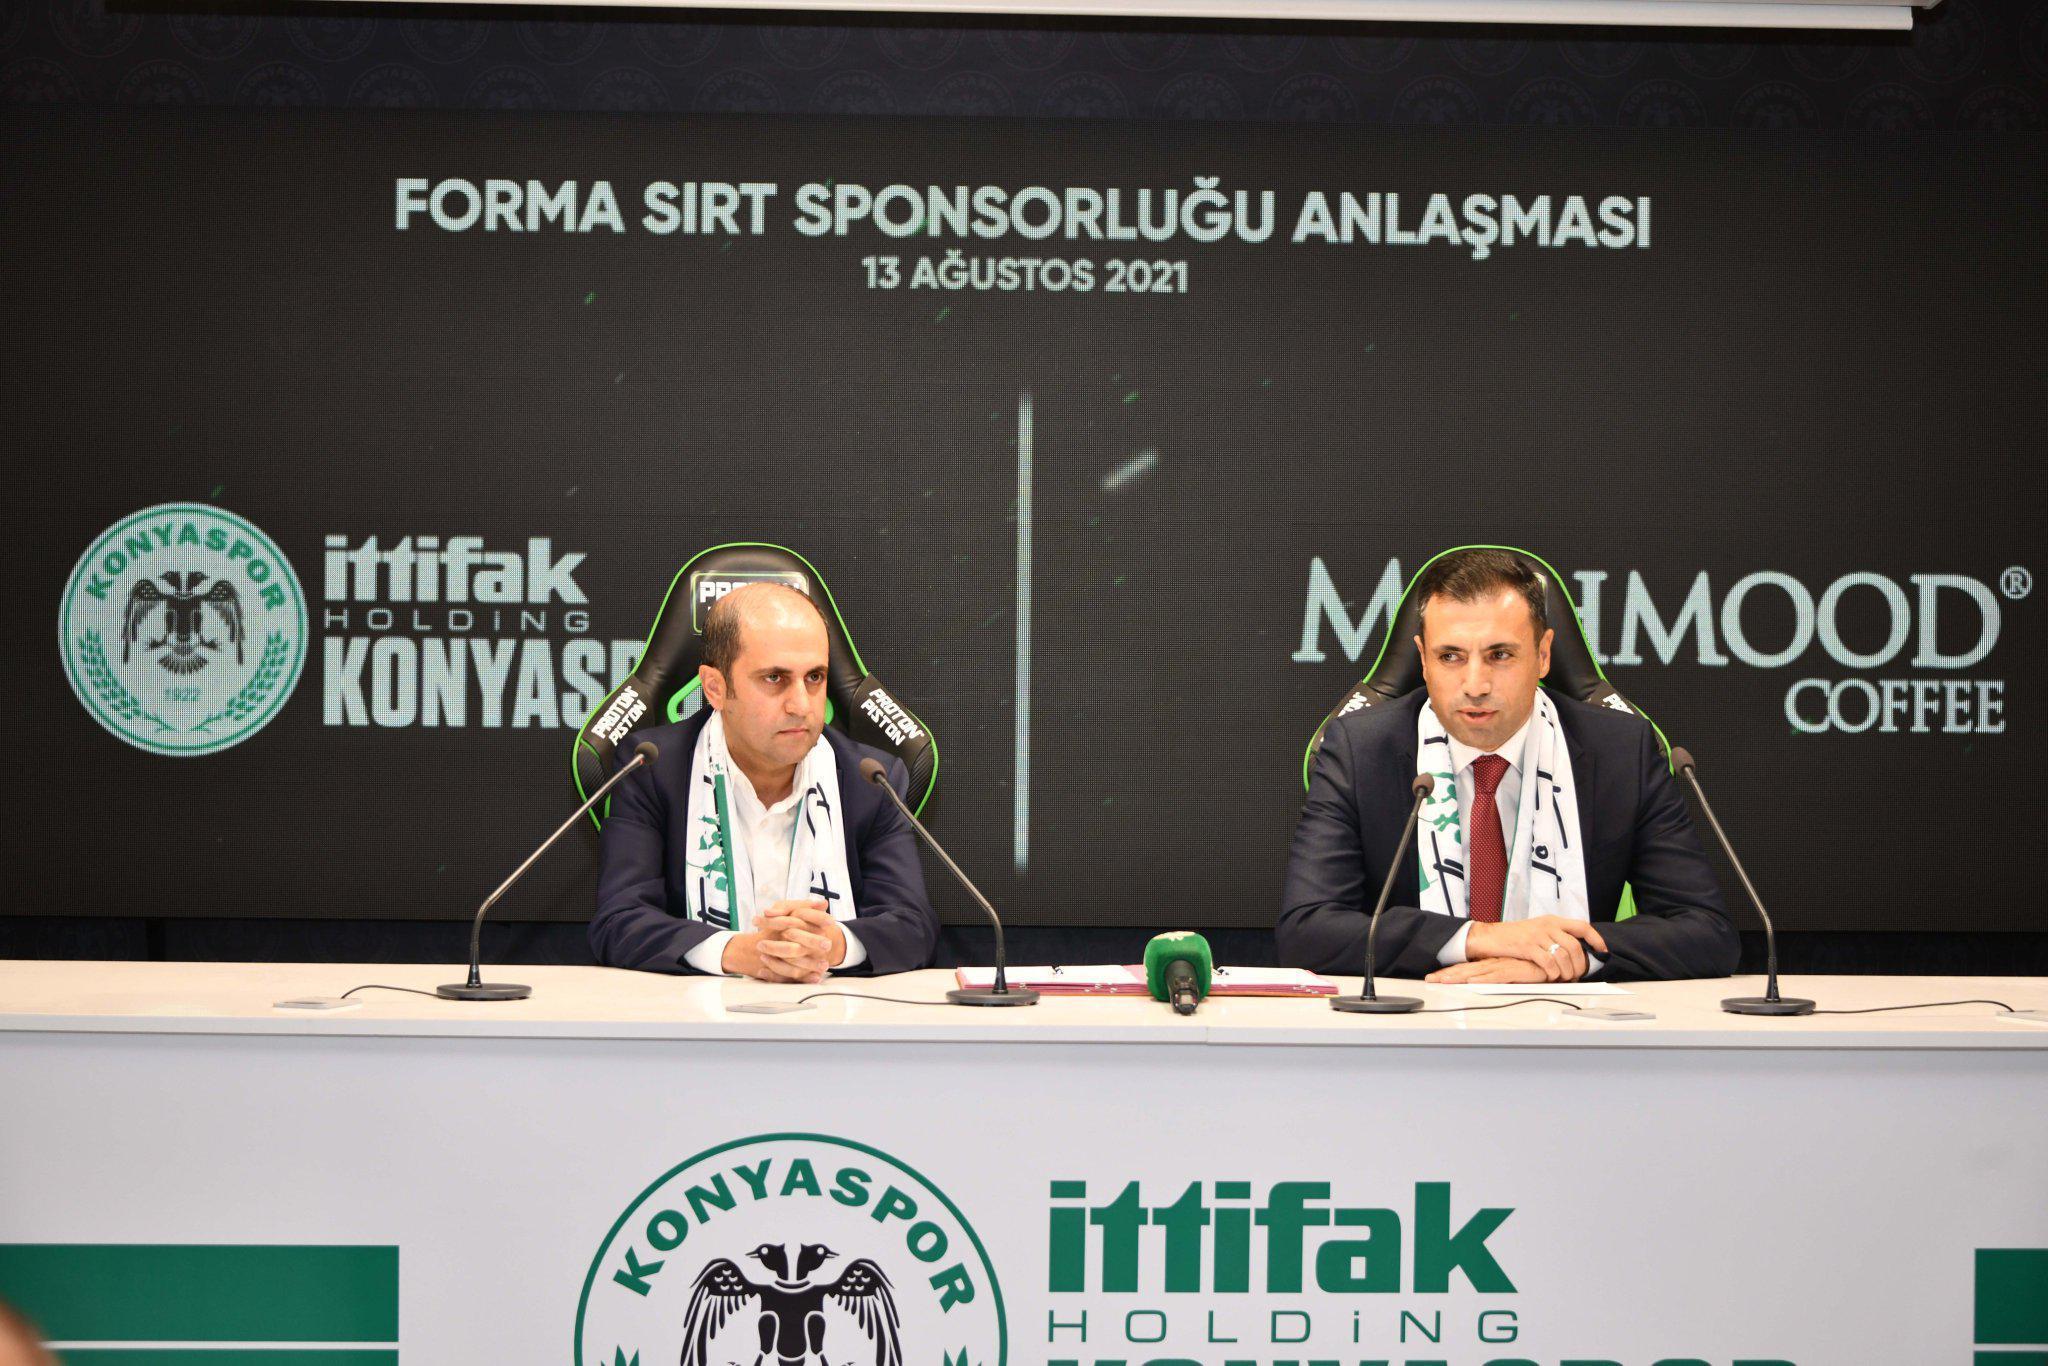 Konyaspor'un forma sırt sponsoru Mahmood Coffee oldu